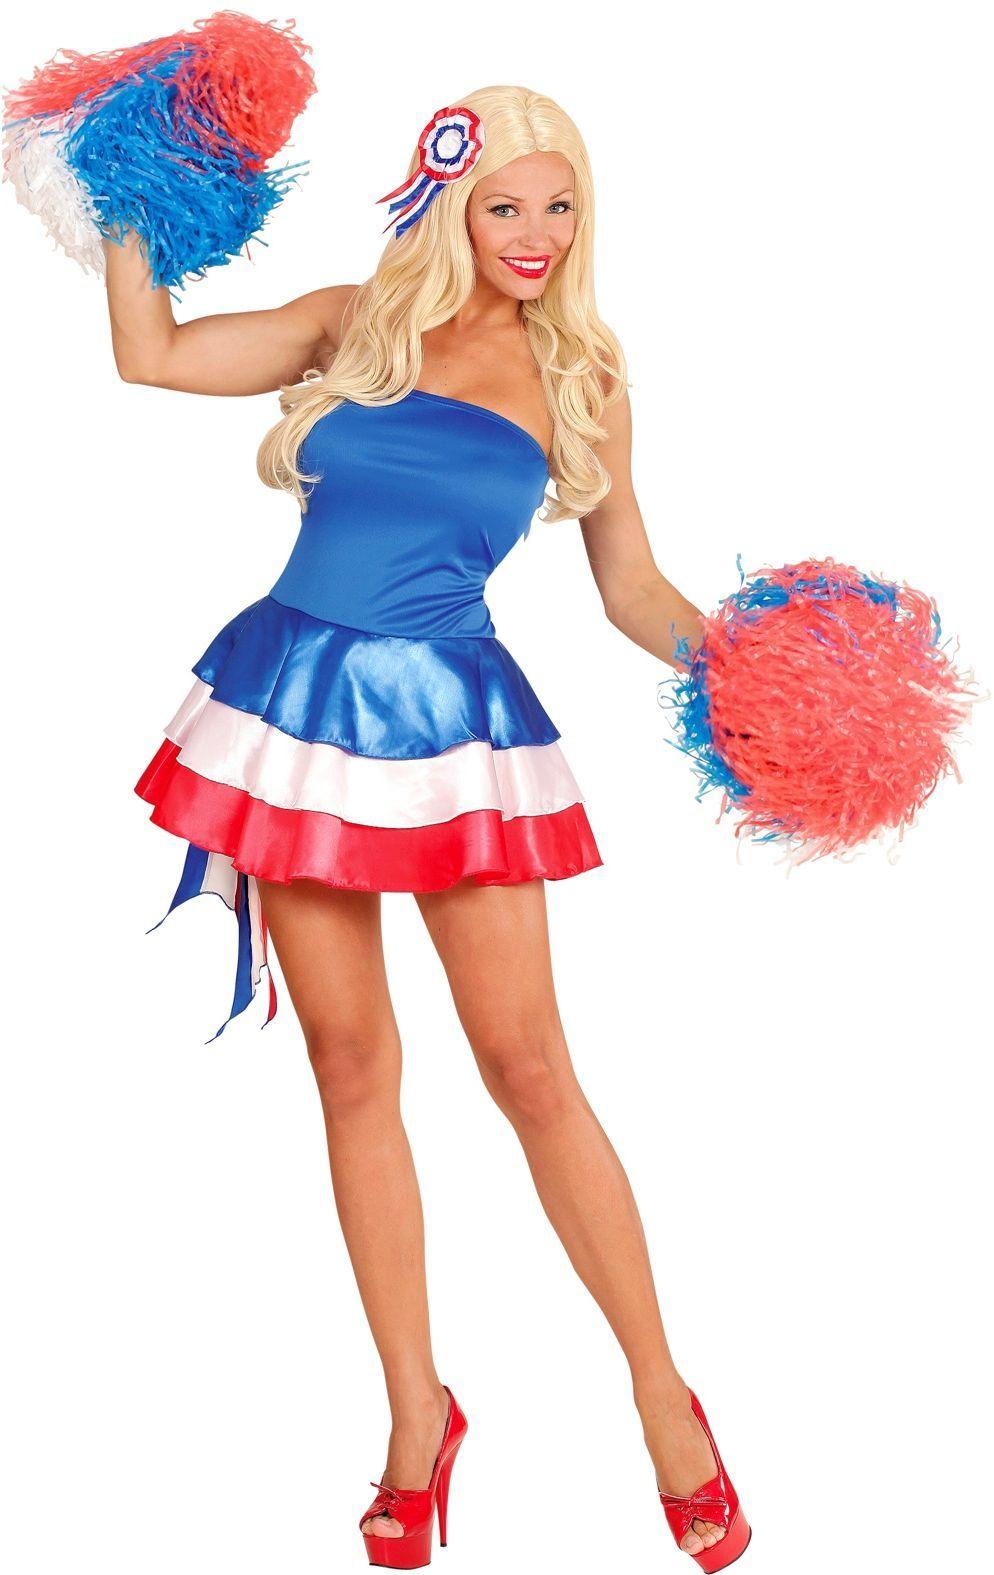 Frans jurk met haarstukje